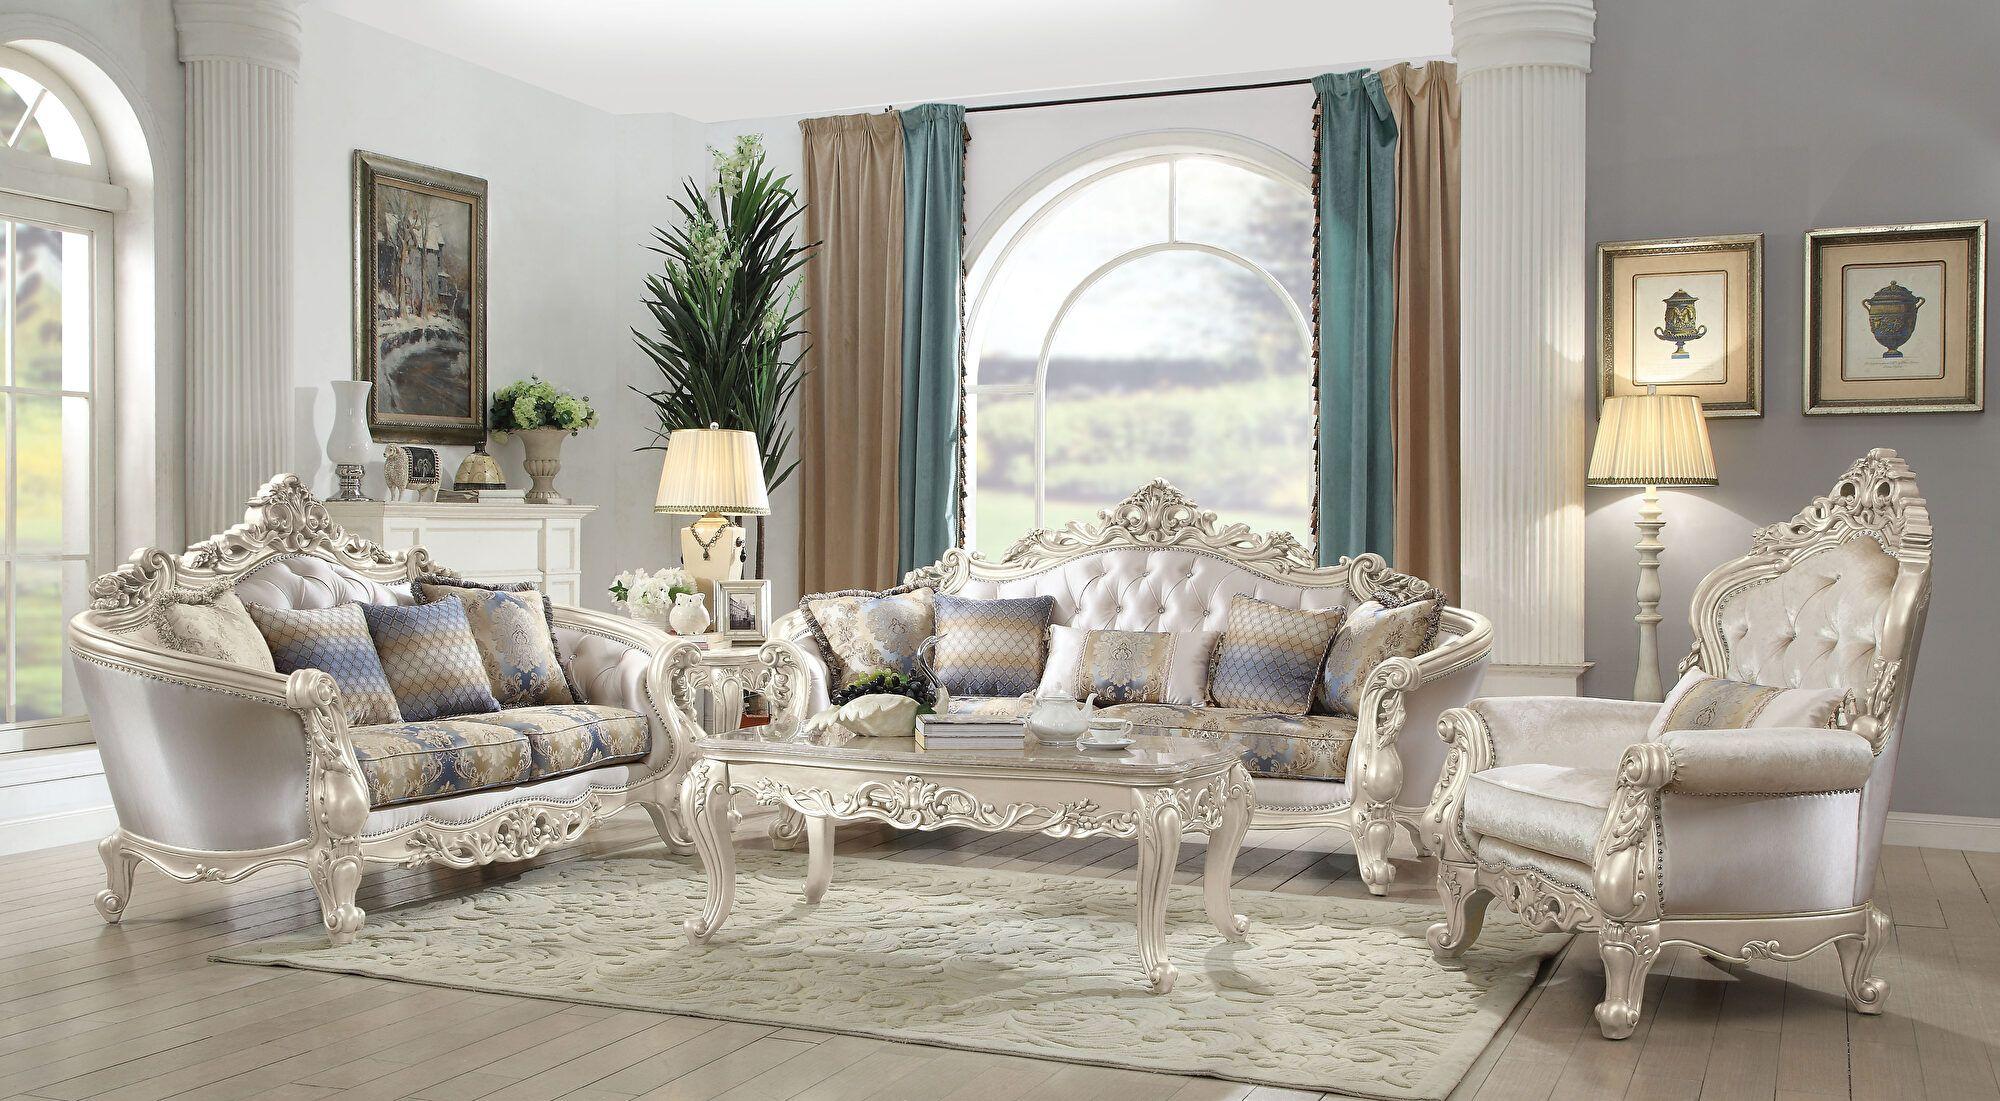 Gorsedd Sofa 52440 82440 Acme Corporation Fabric Sofas Living Room Sets Luxury Sofa Traditional Living Room Sets